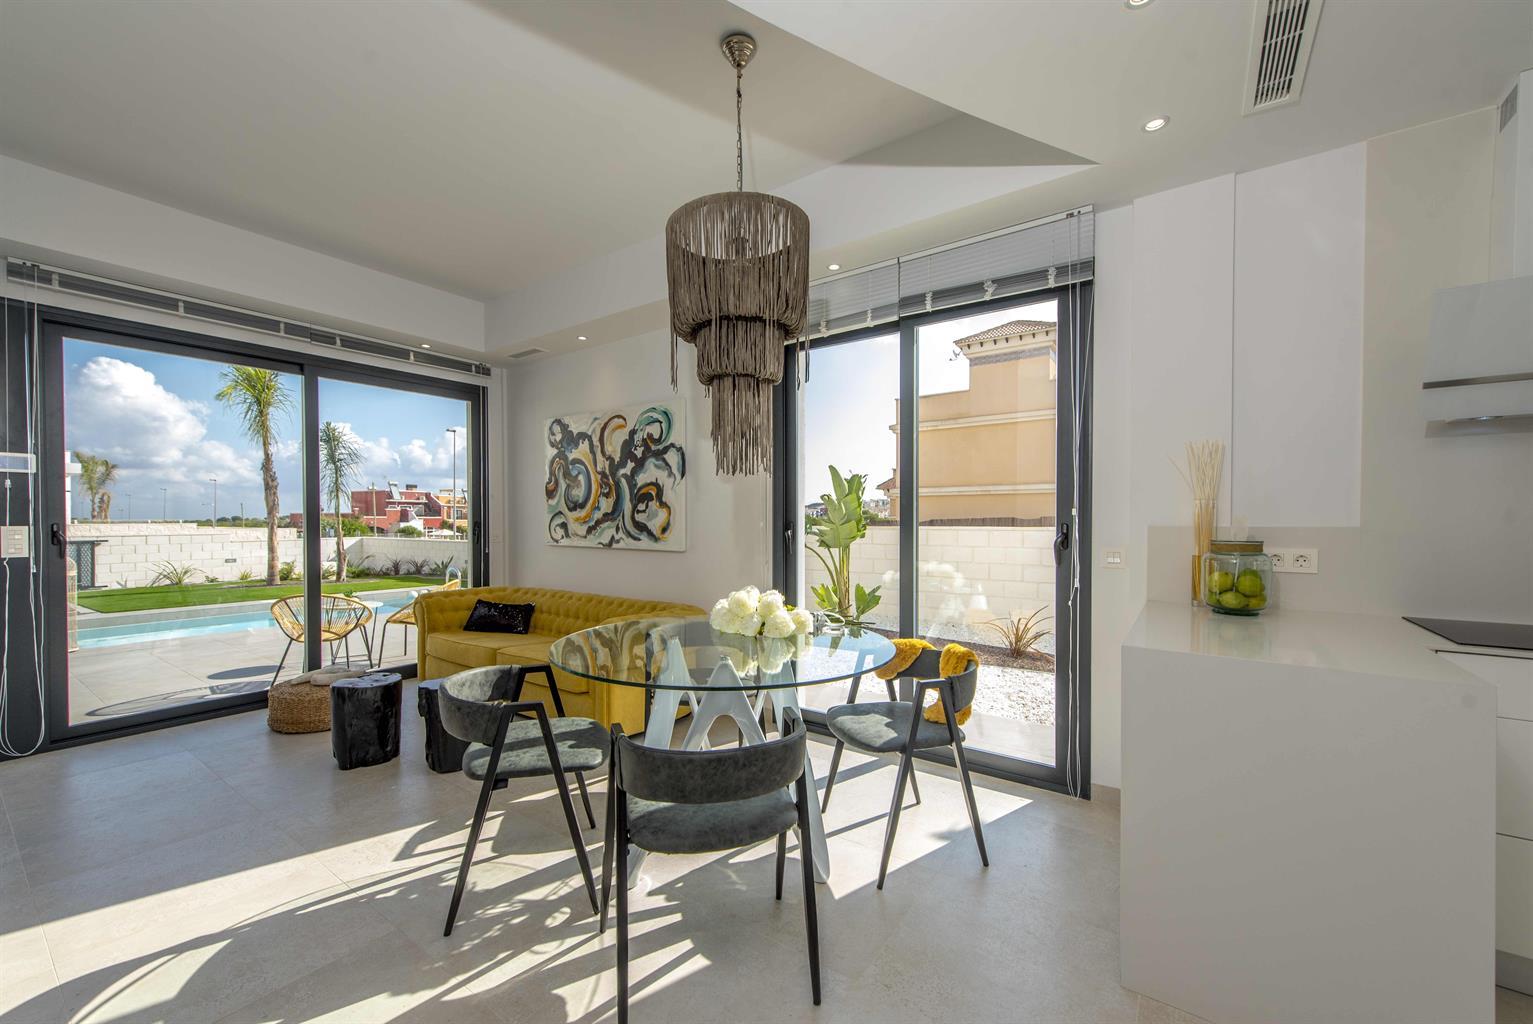 Maison - Villamartin - #4227904-2